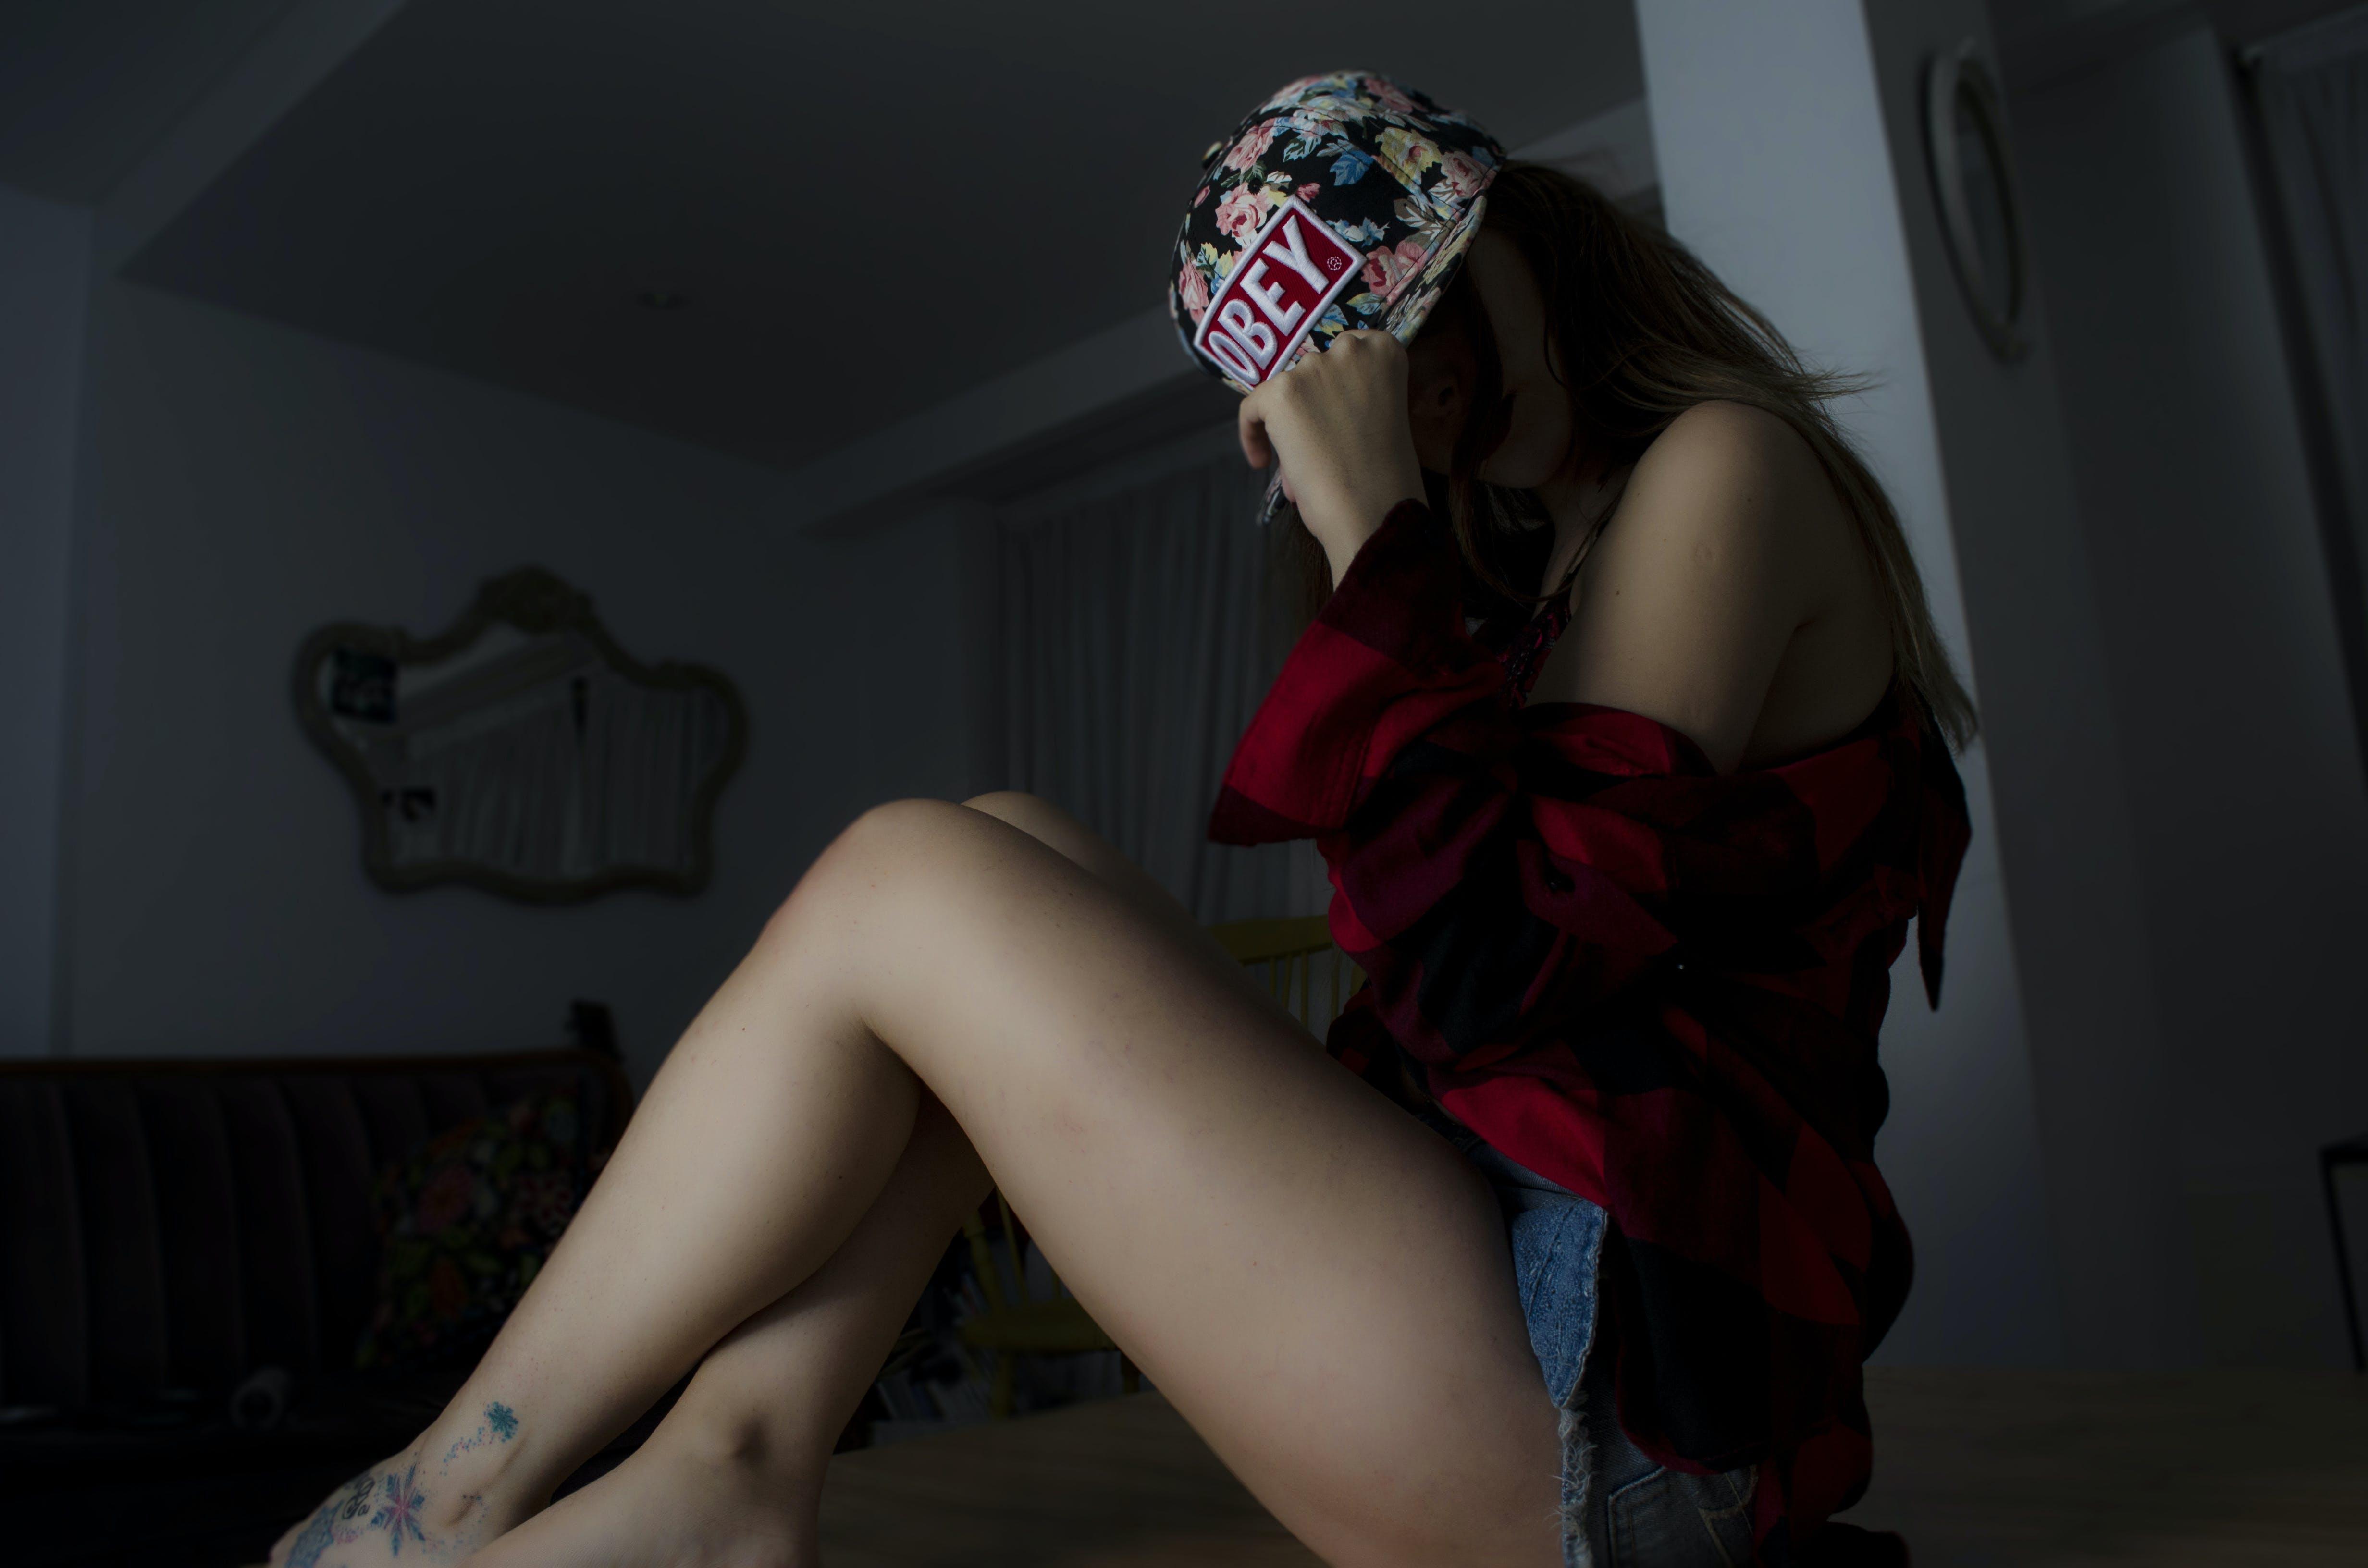 Kostenloses Stock Foto zu dame, erwachsener, fashion, fokus